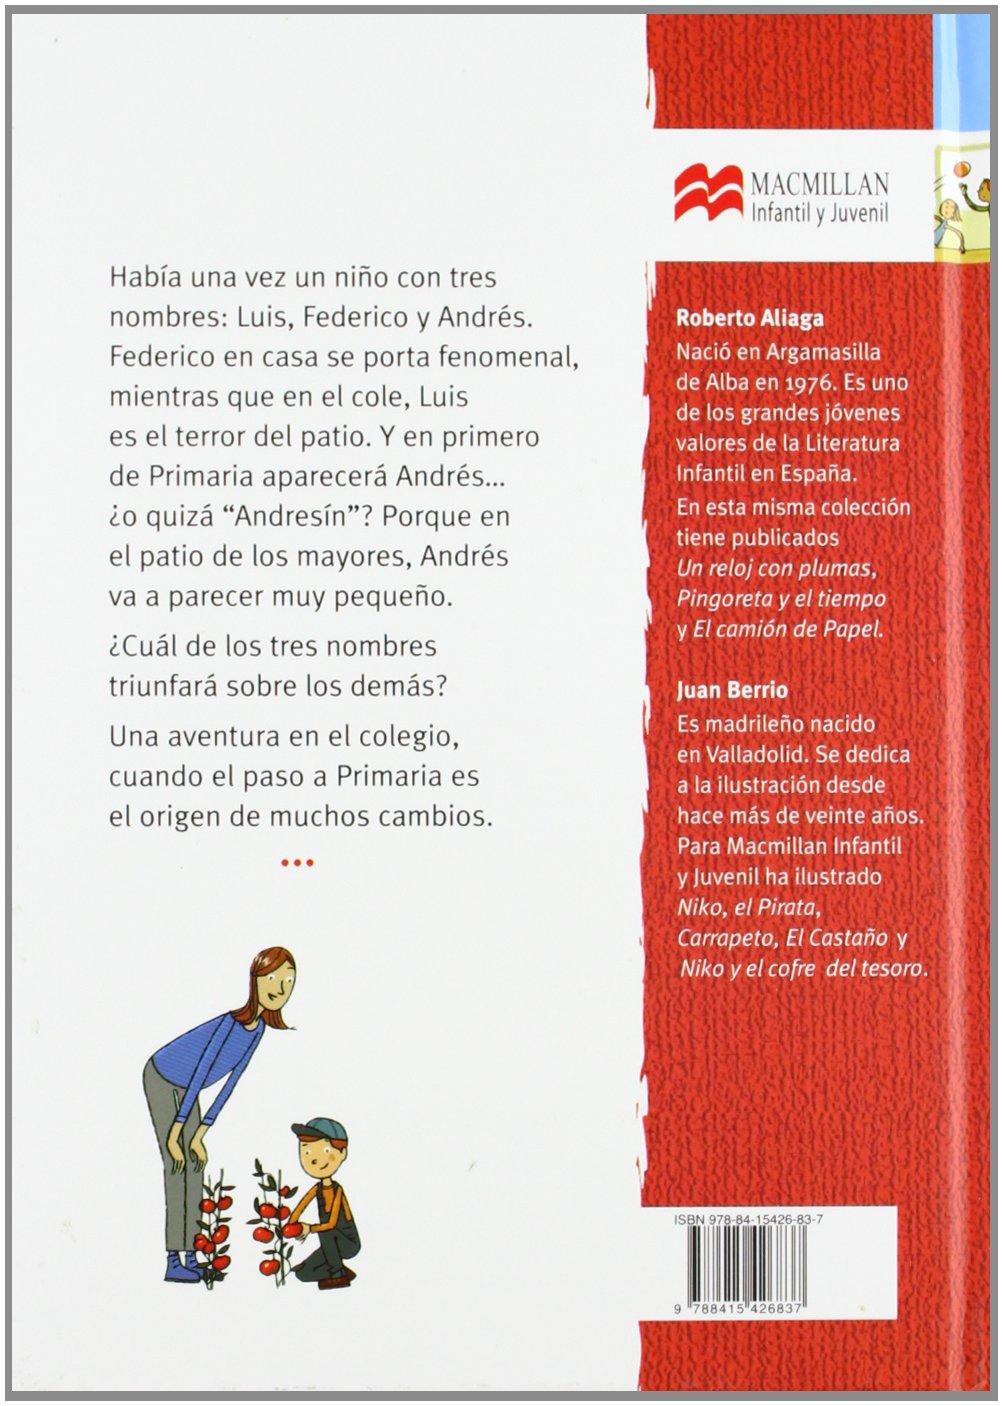 yamasco 4,5/mm arranque de retroceso cuerda//cuerda para Stihl Husqvarna Poulan motosierra desbrozadora